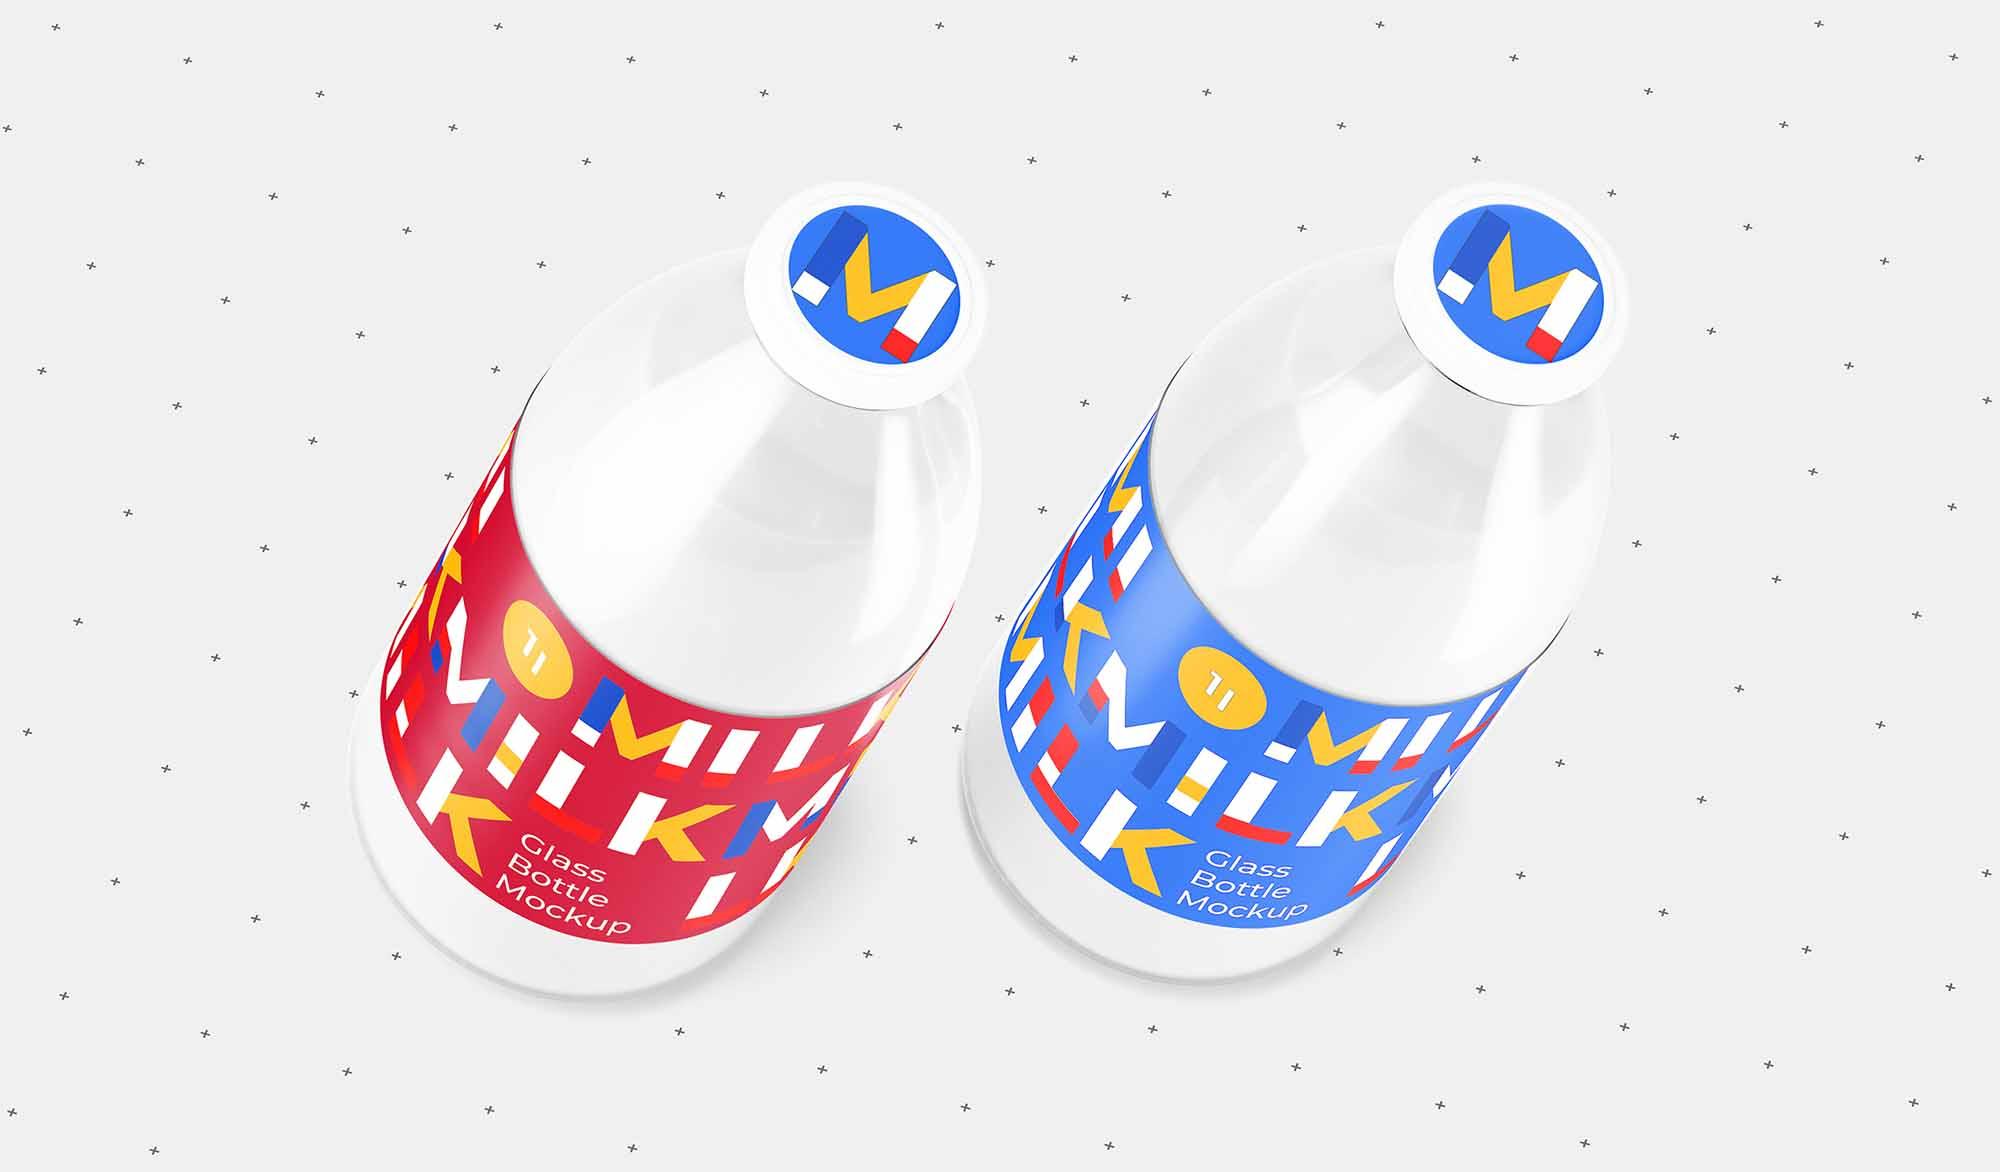 Milk Bottle Mockup 3